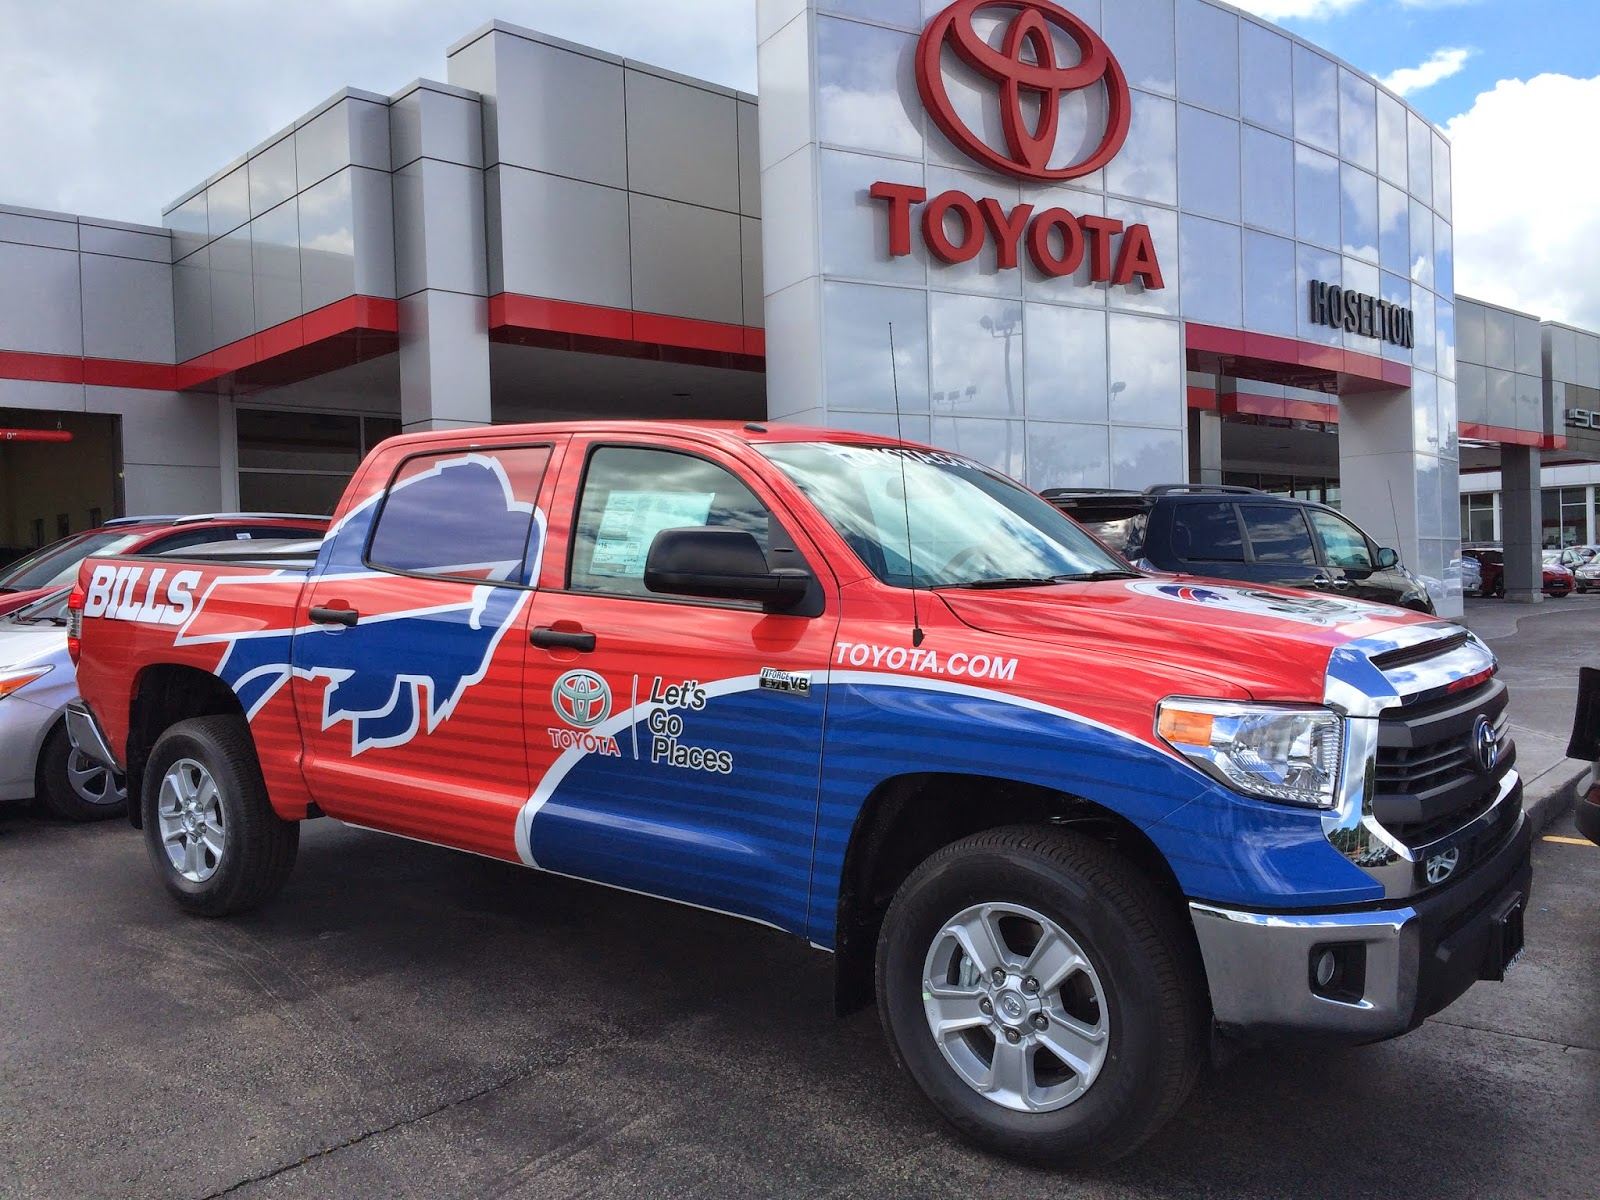 8dfd8755b29 Hoselton Auto Mall  The Buffalo Bills Training Camp Toyota Truck is ...